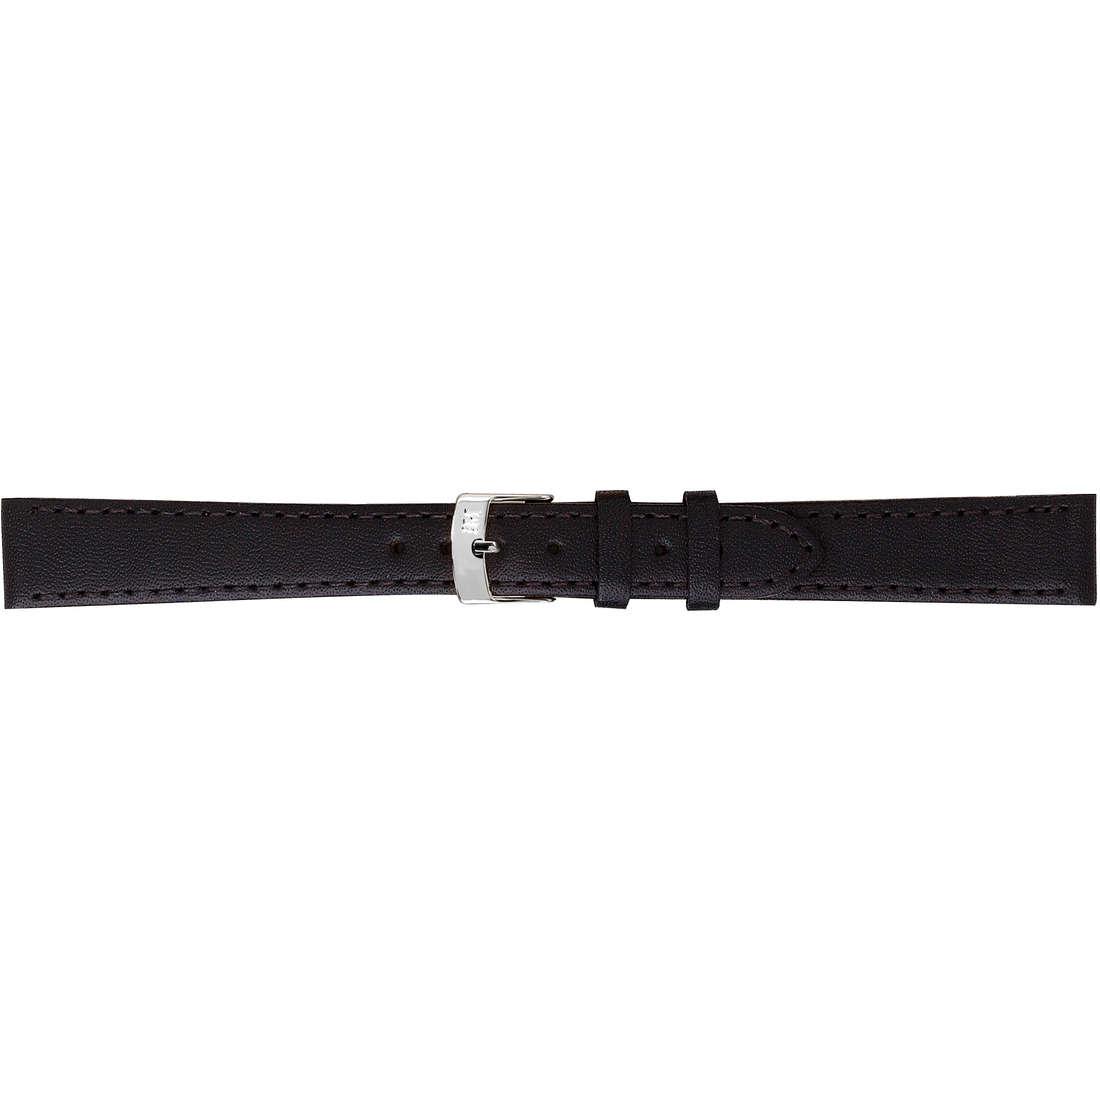 watch watch bands watch straps man Morellato Performance A01X2619875019CR14